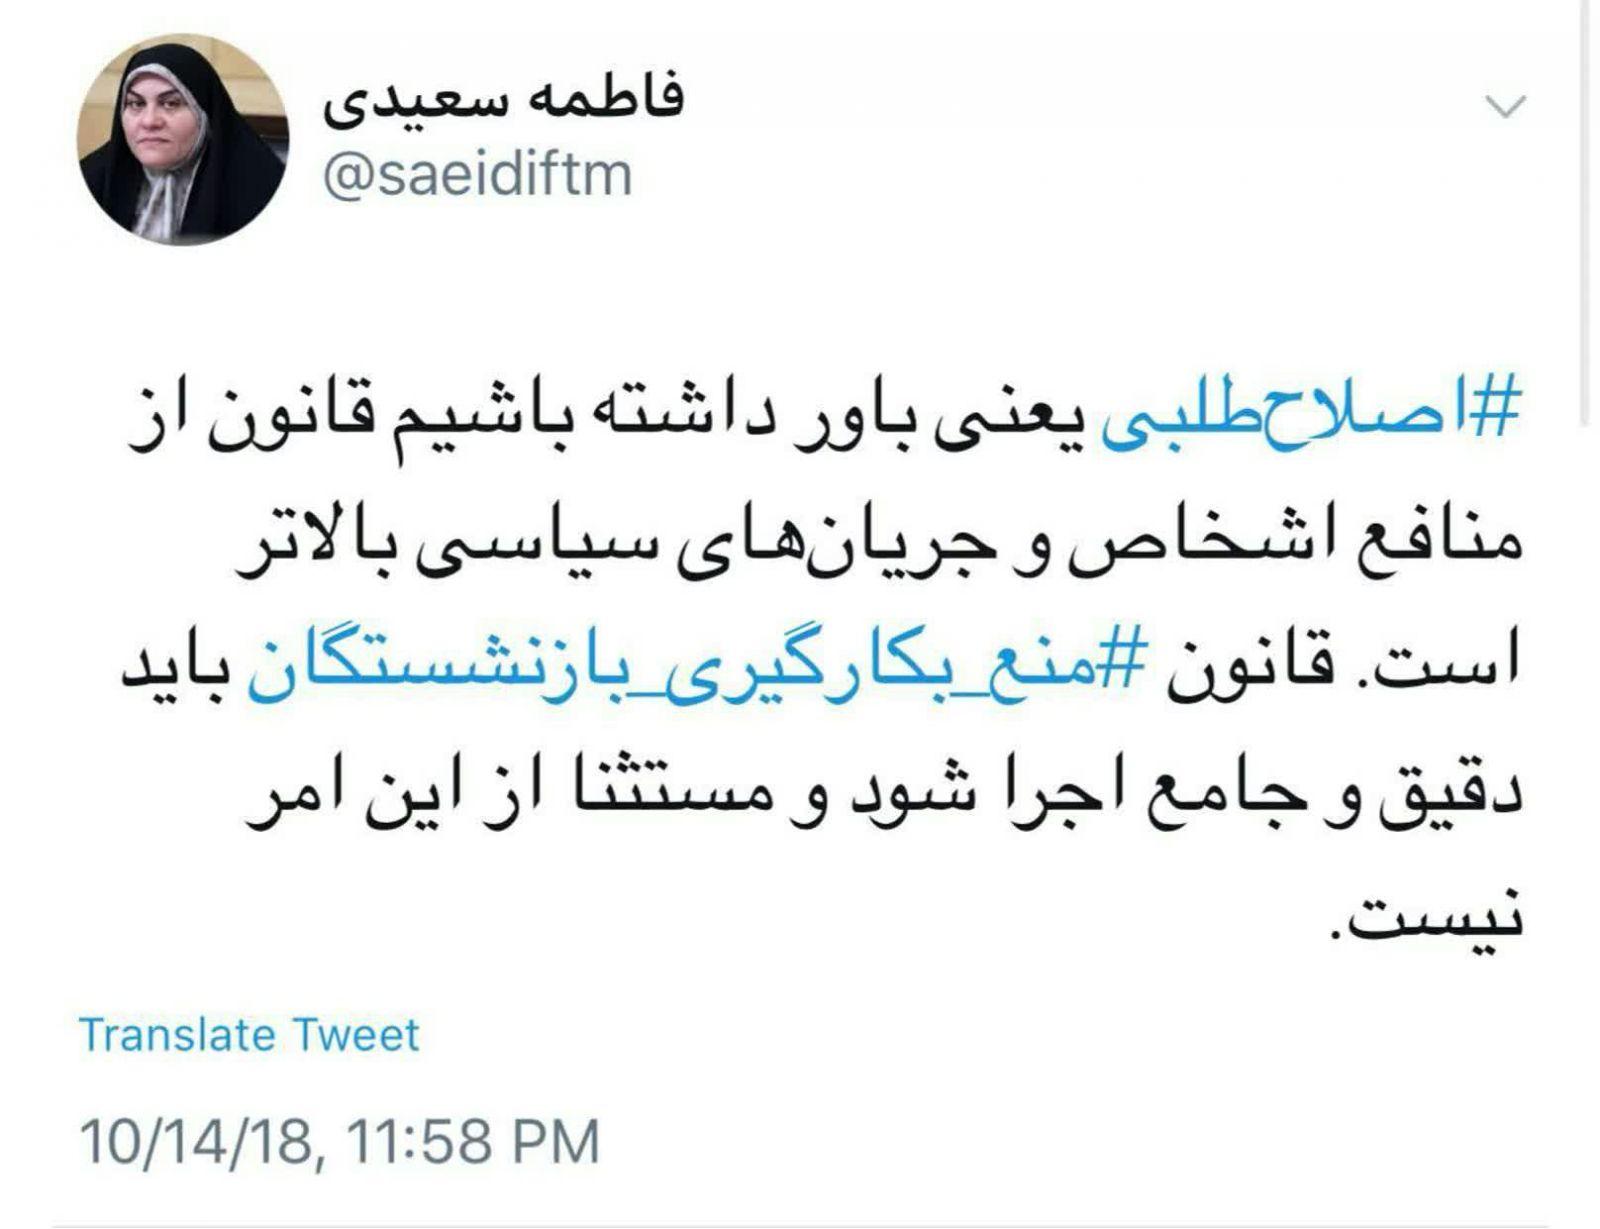 photo 2018 10 15 10 03 46 - مرامنامه نانوشته اصلاحطلبان: «قانون یعنی منافع ما»